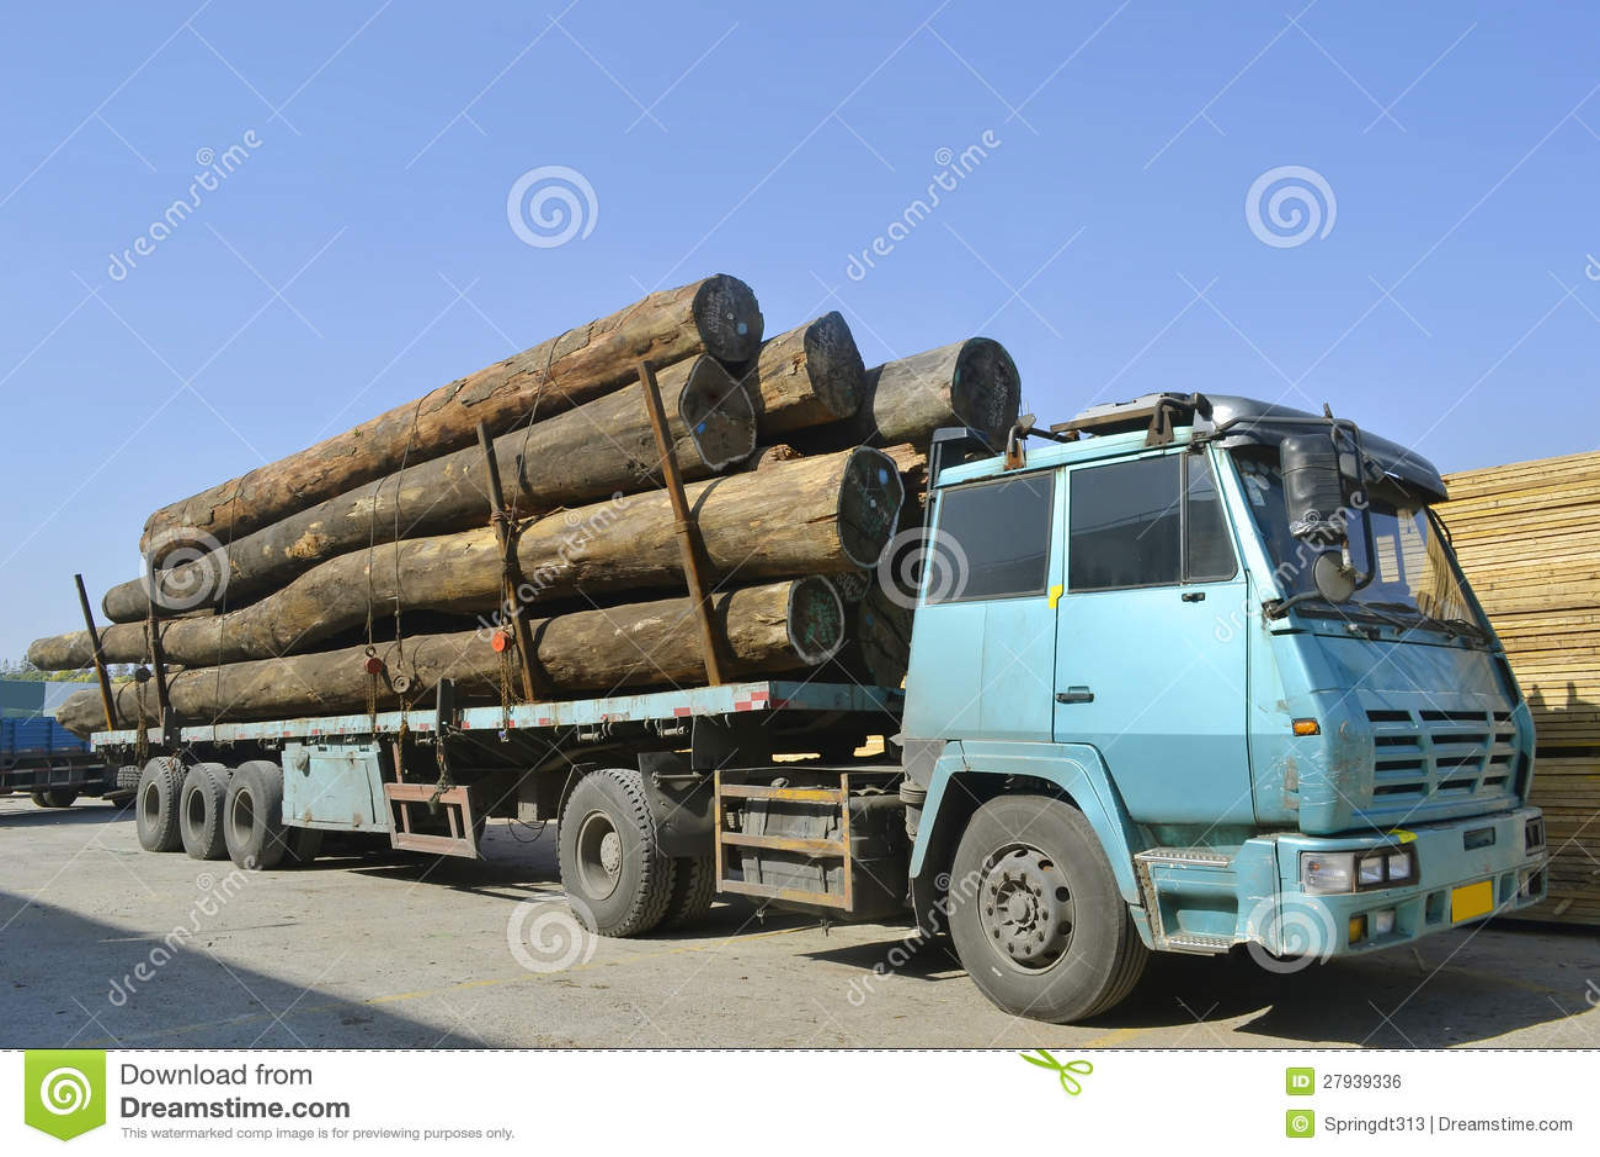 Wood Transportation Truck Royalty Free Stock Image - Image: 27939336